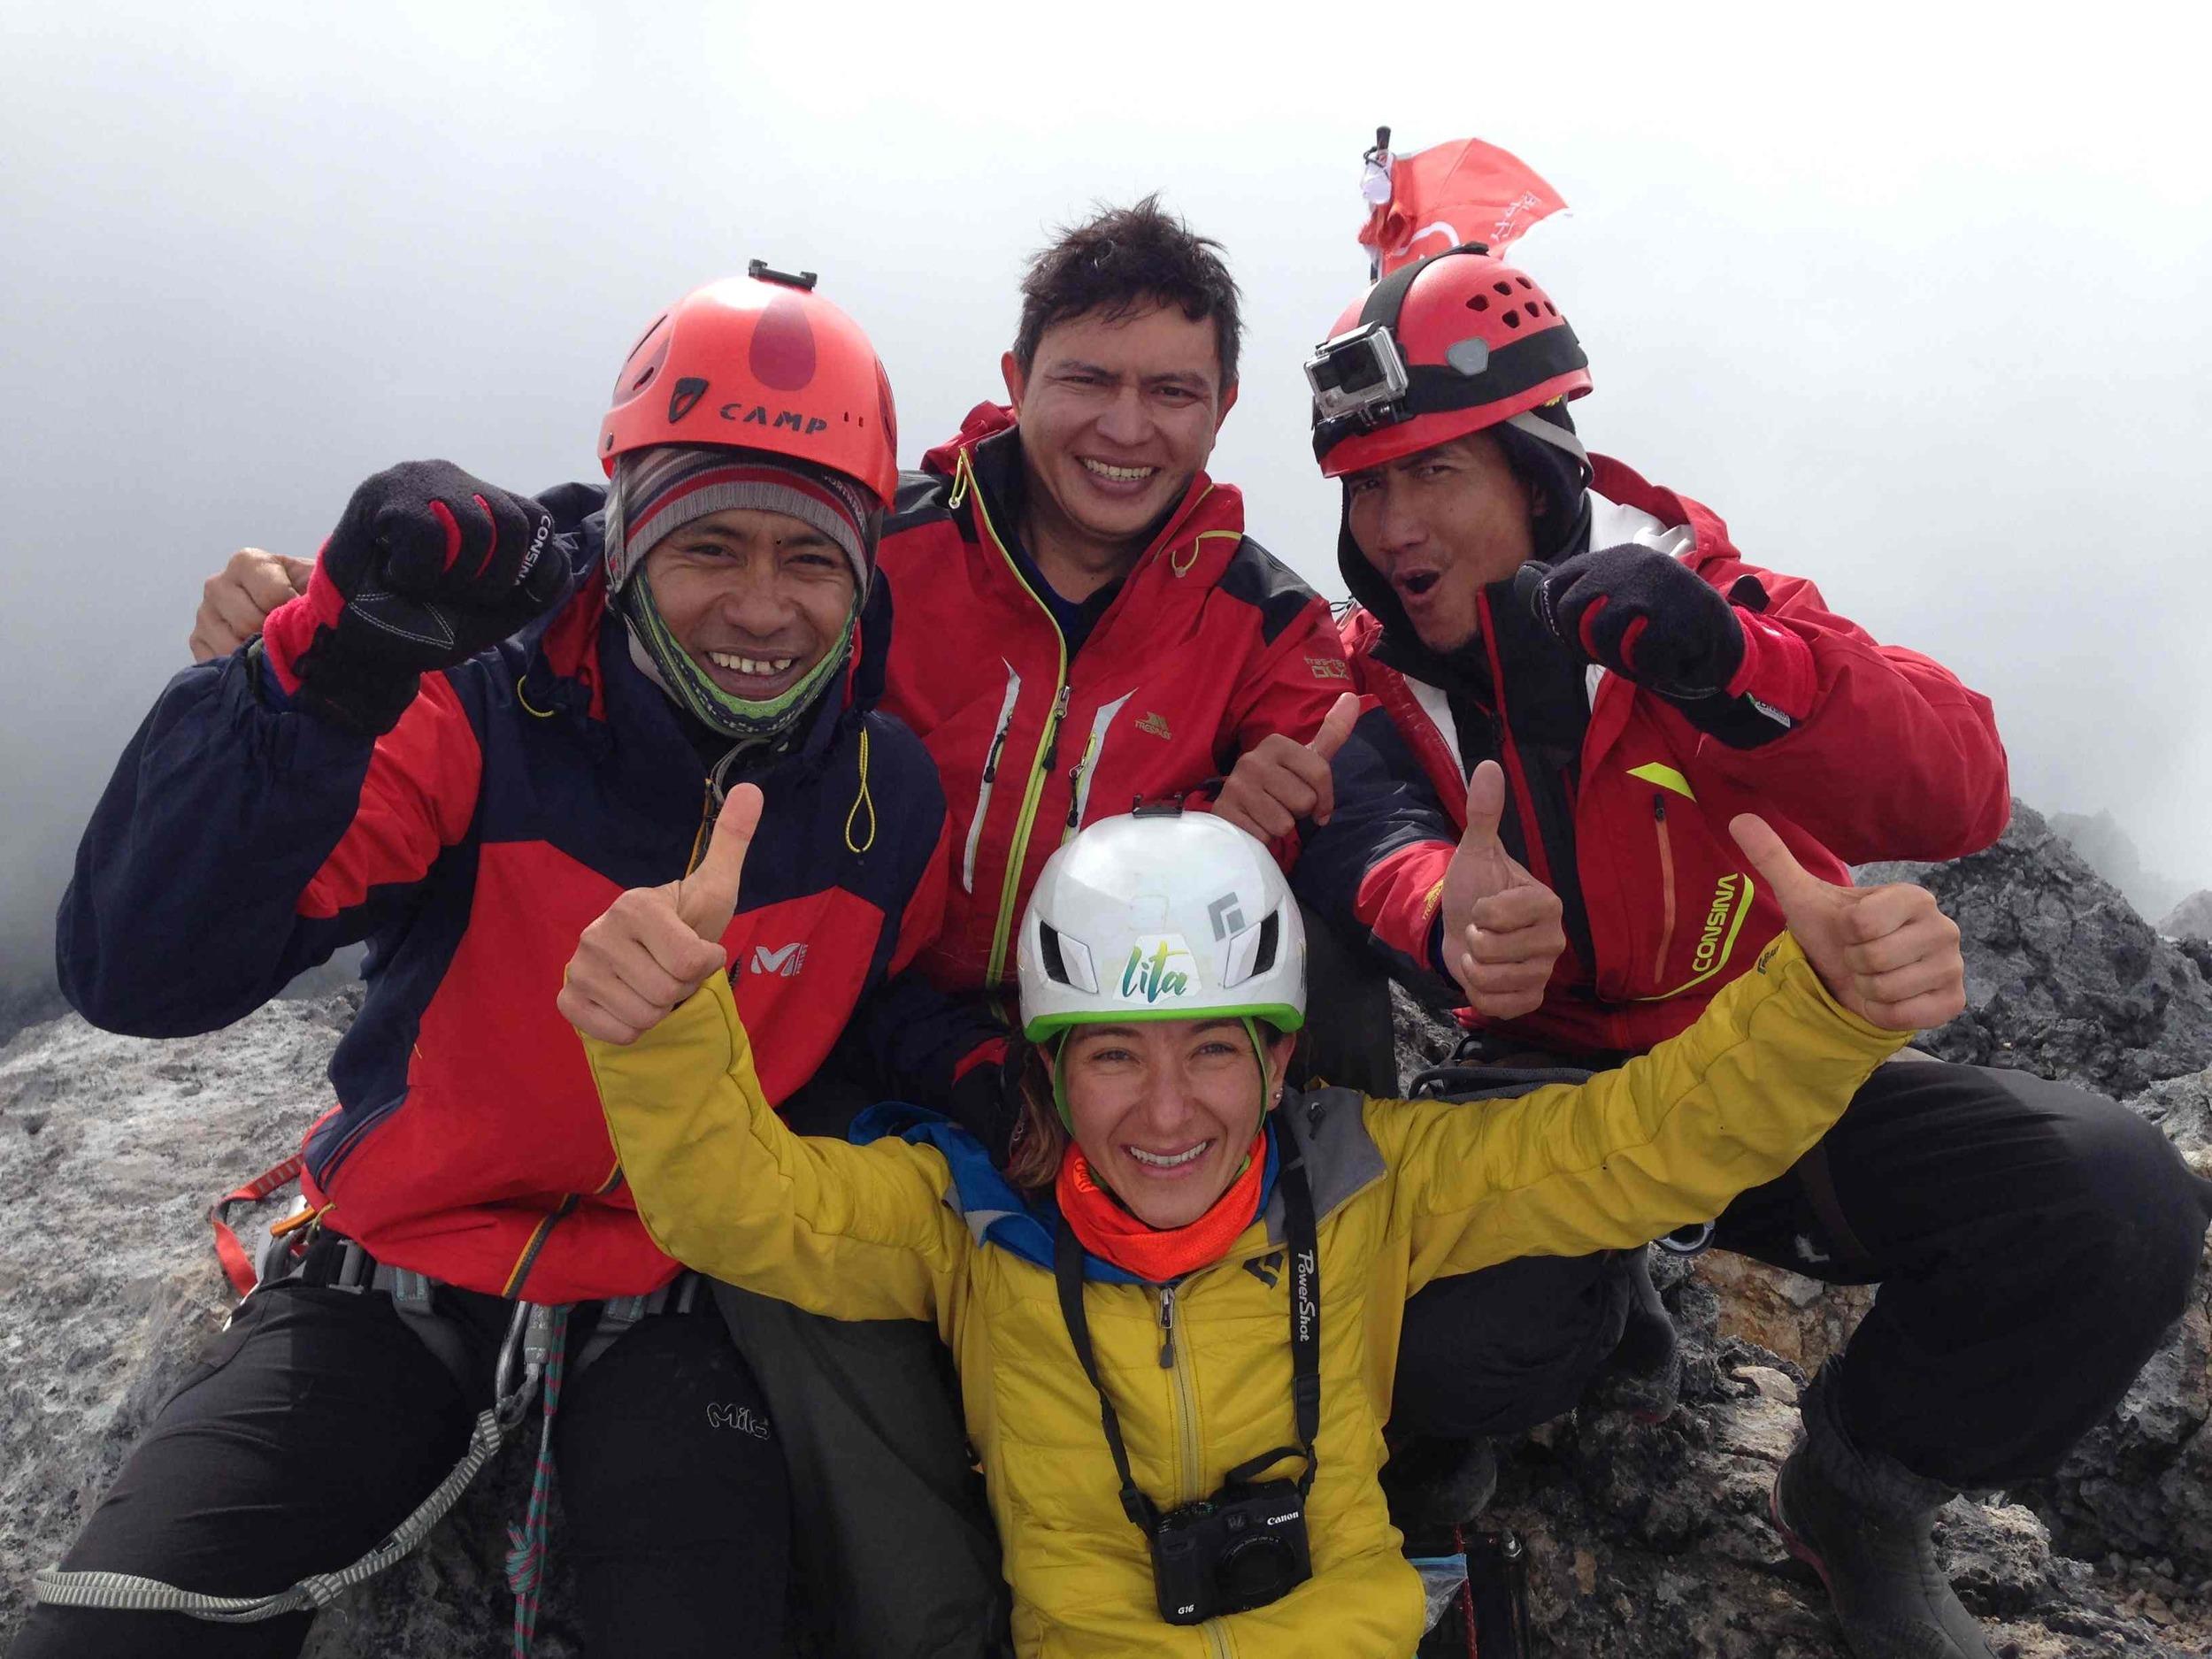 Zirve! / The summit!